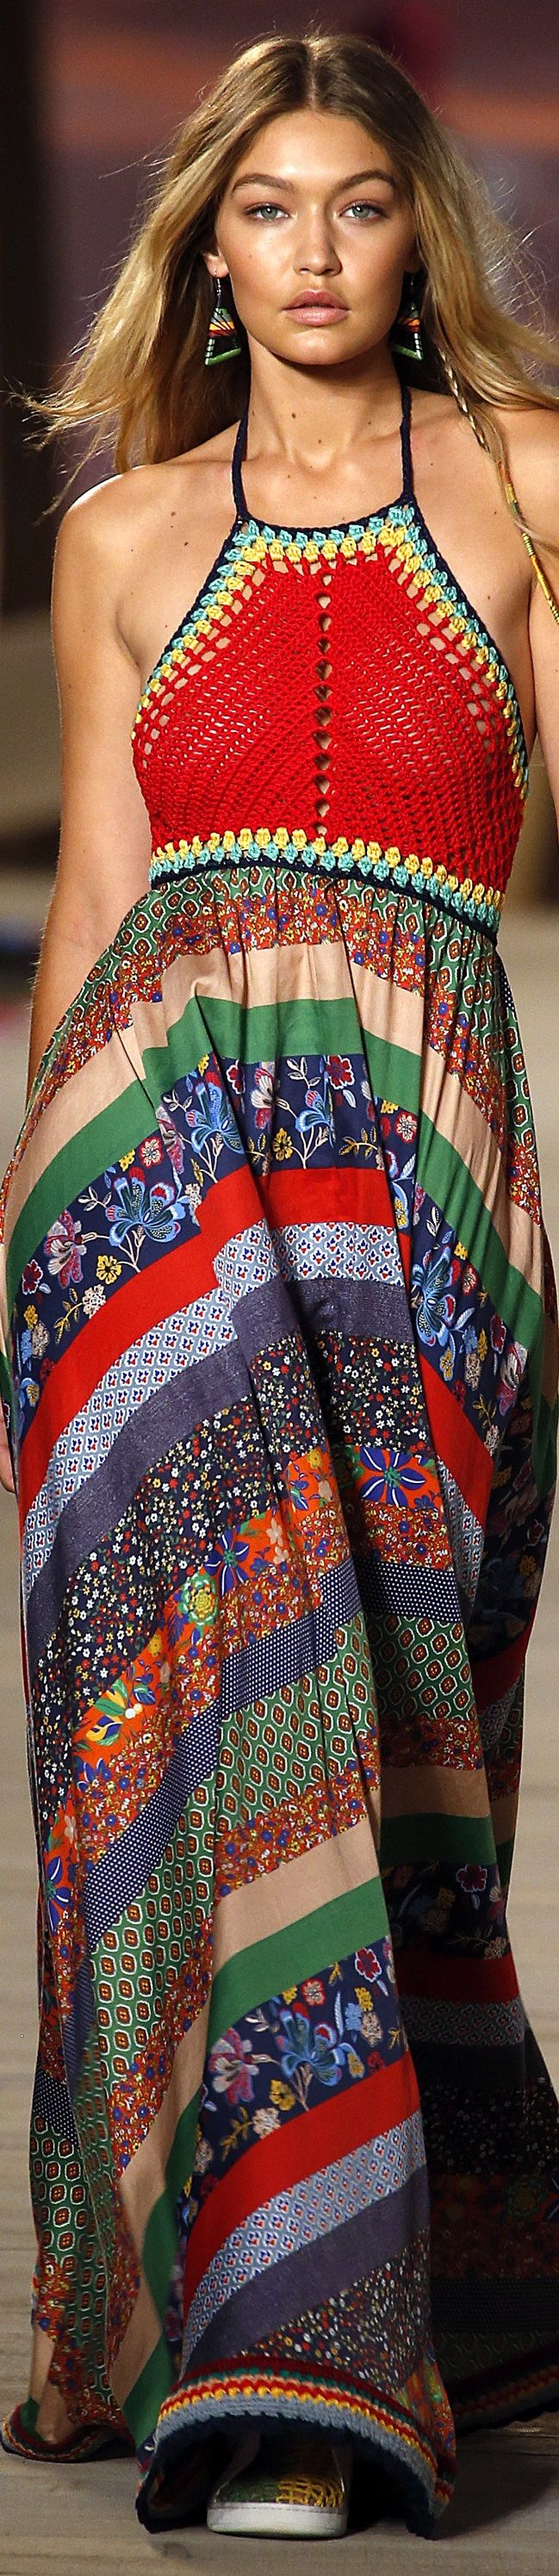 Tommy Hilfiger Spring 2016 Rtw Boho Fashion Ideias Fashion Estilo Boho Croche Fashion